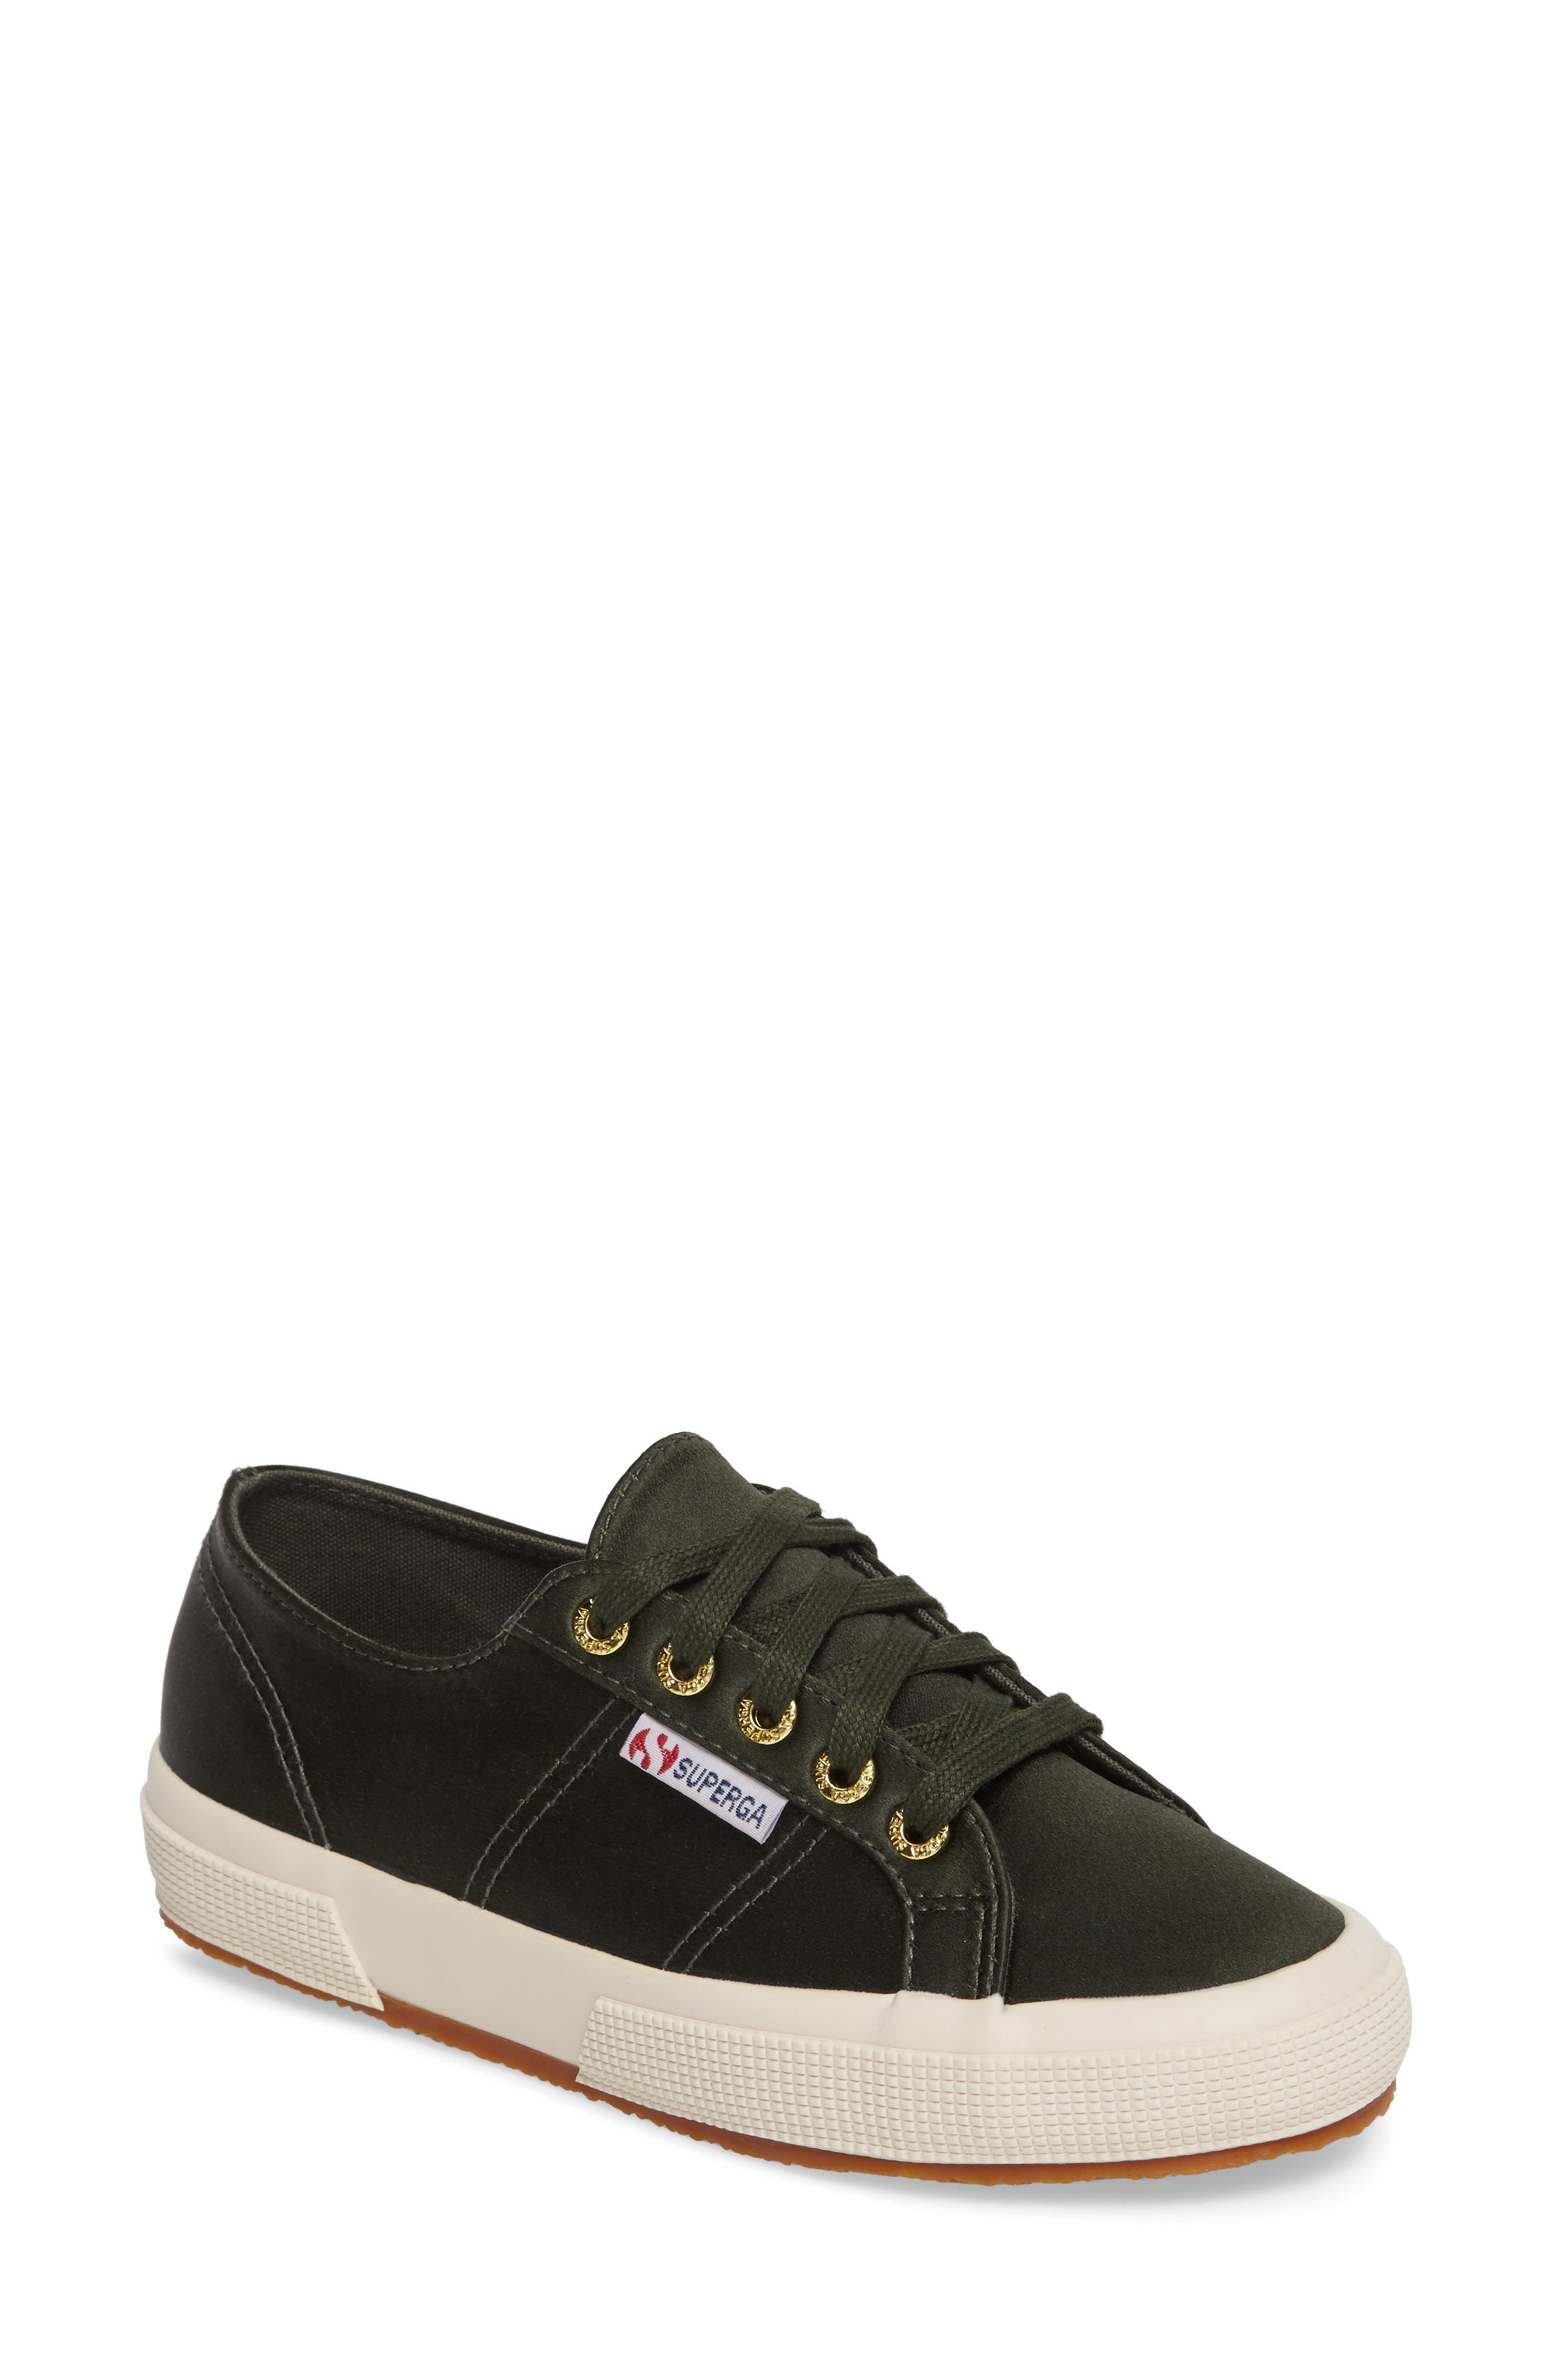 Superga Satin Sneaker (Women)